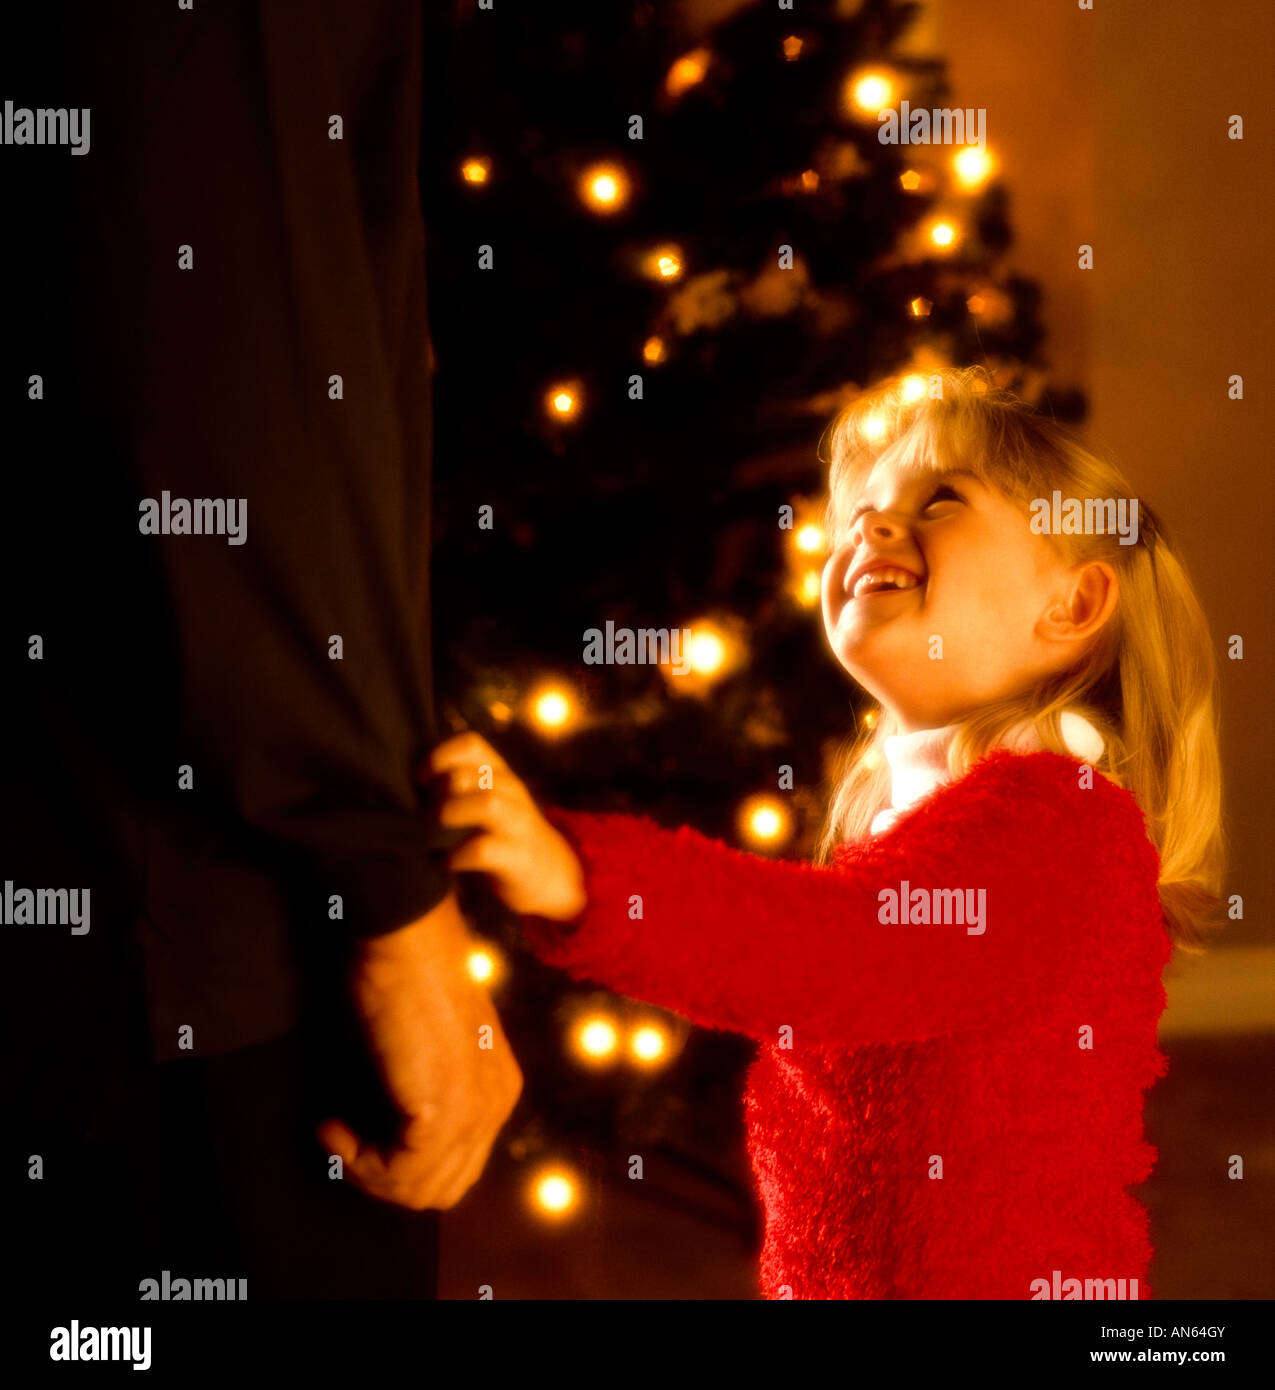 A girl at Christmastime - Stock Image